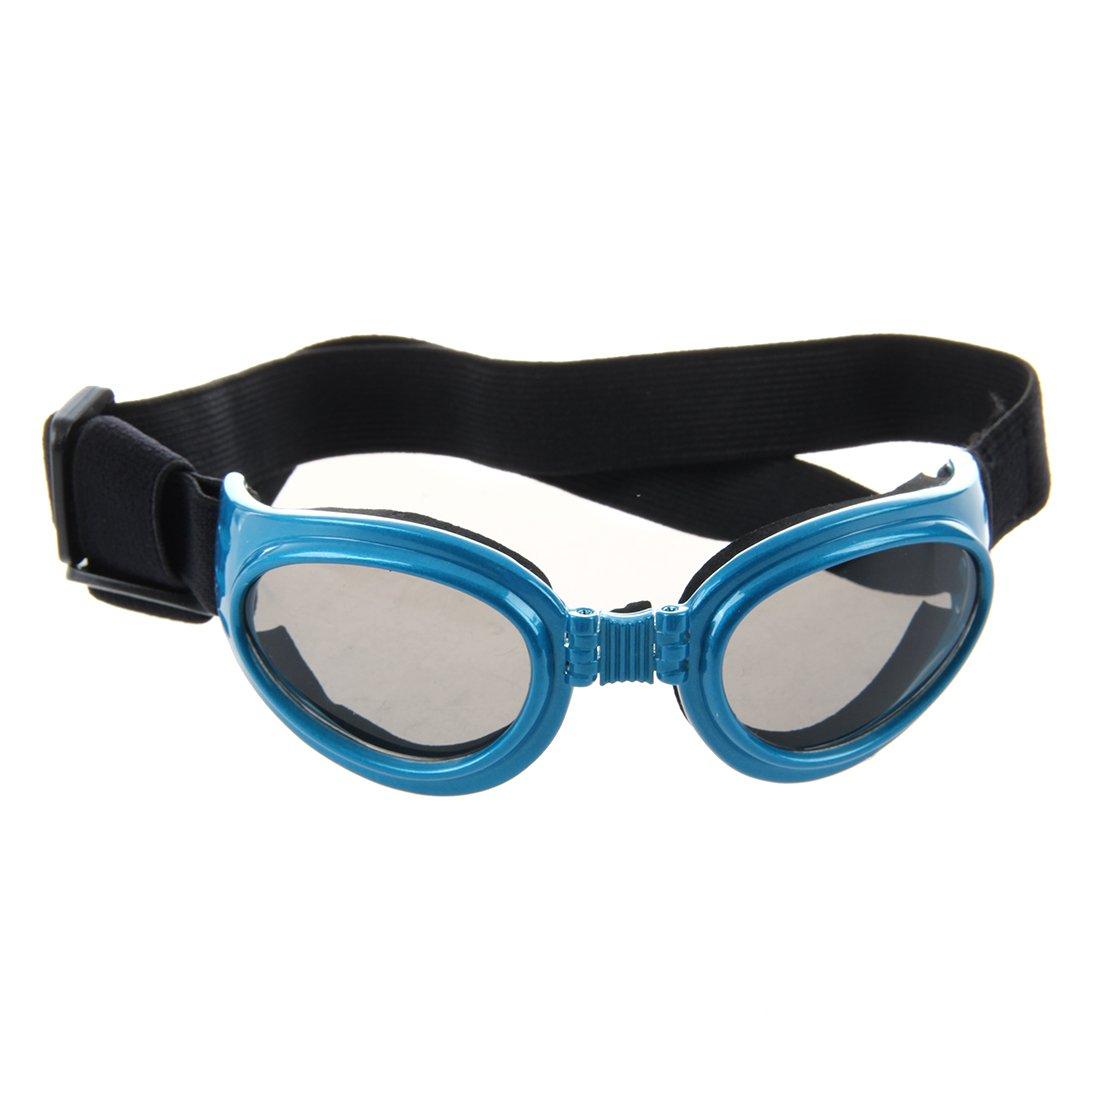 TOOGOO(R) Blue Framed Pet Puppy Dog UV Protection Doggles Goggles Sunglasses Eyewear